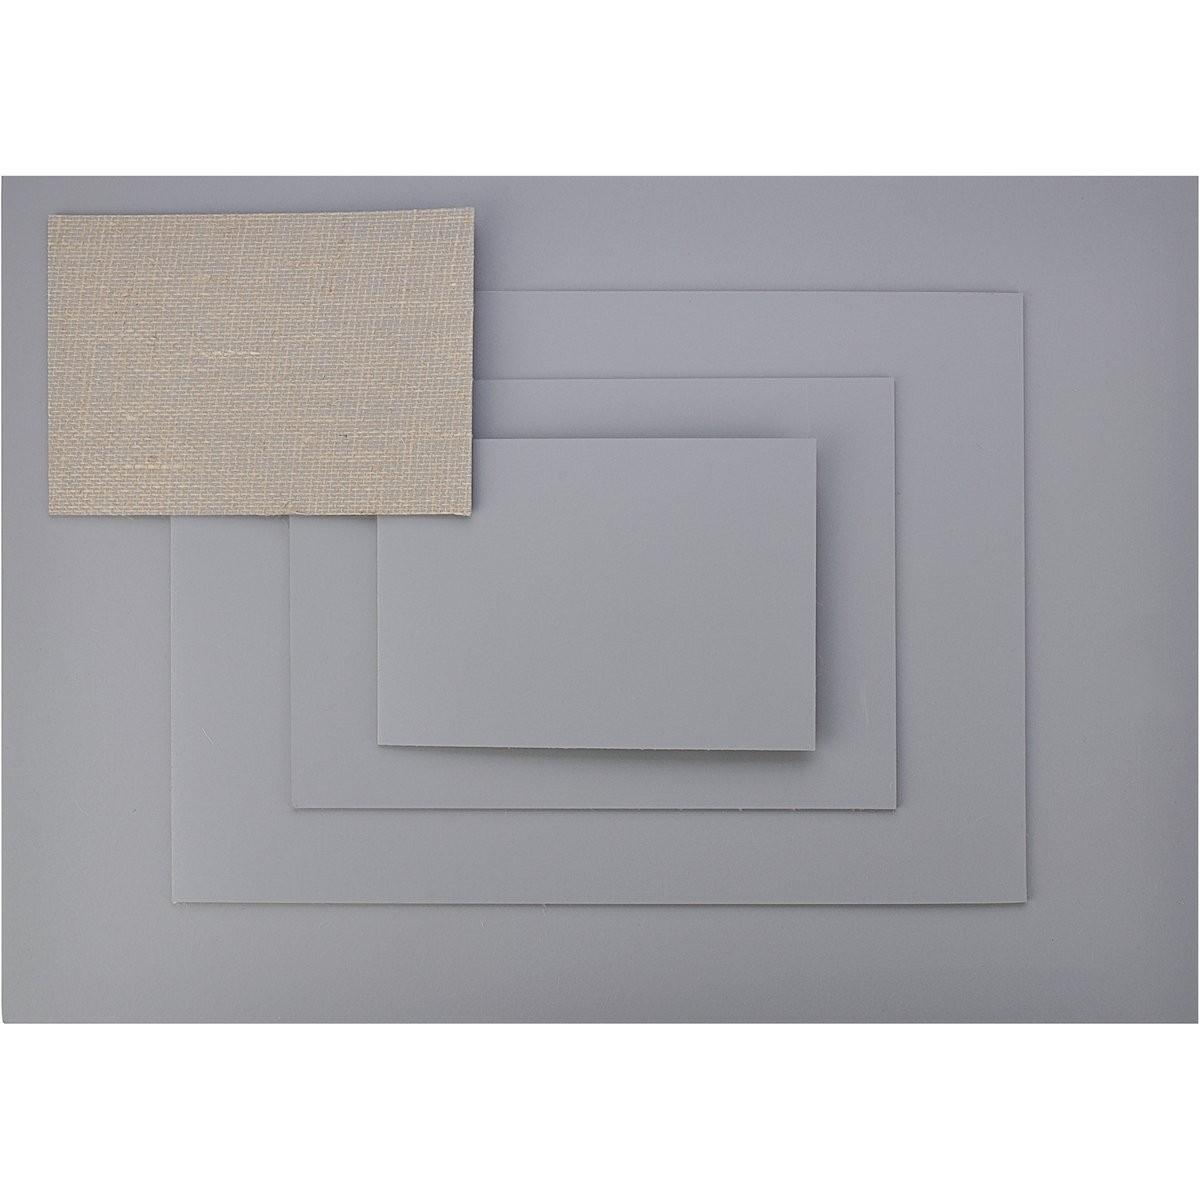 Linoleum, professionel, mat, grå